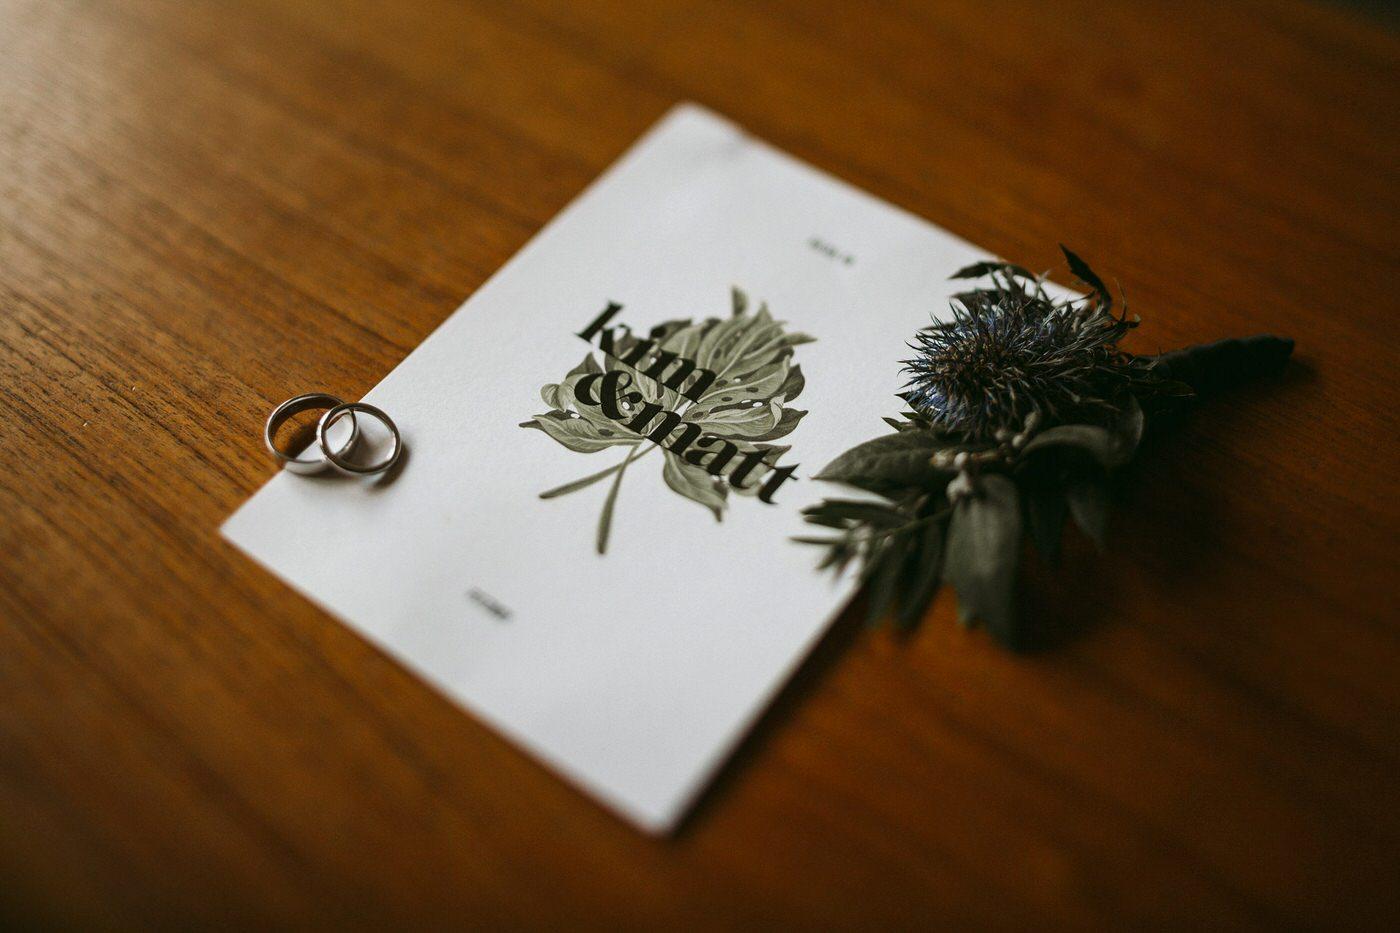 GoldandGrit_KimMatt_Panama-Dining-Room-Fitzroy-Collingwood-Relaxed-Fun-Candid-Wedding-Photography_4.jpg